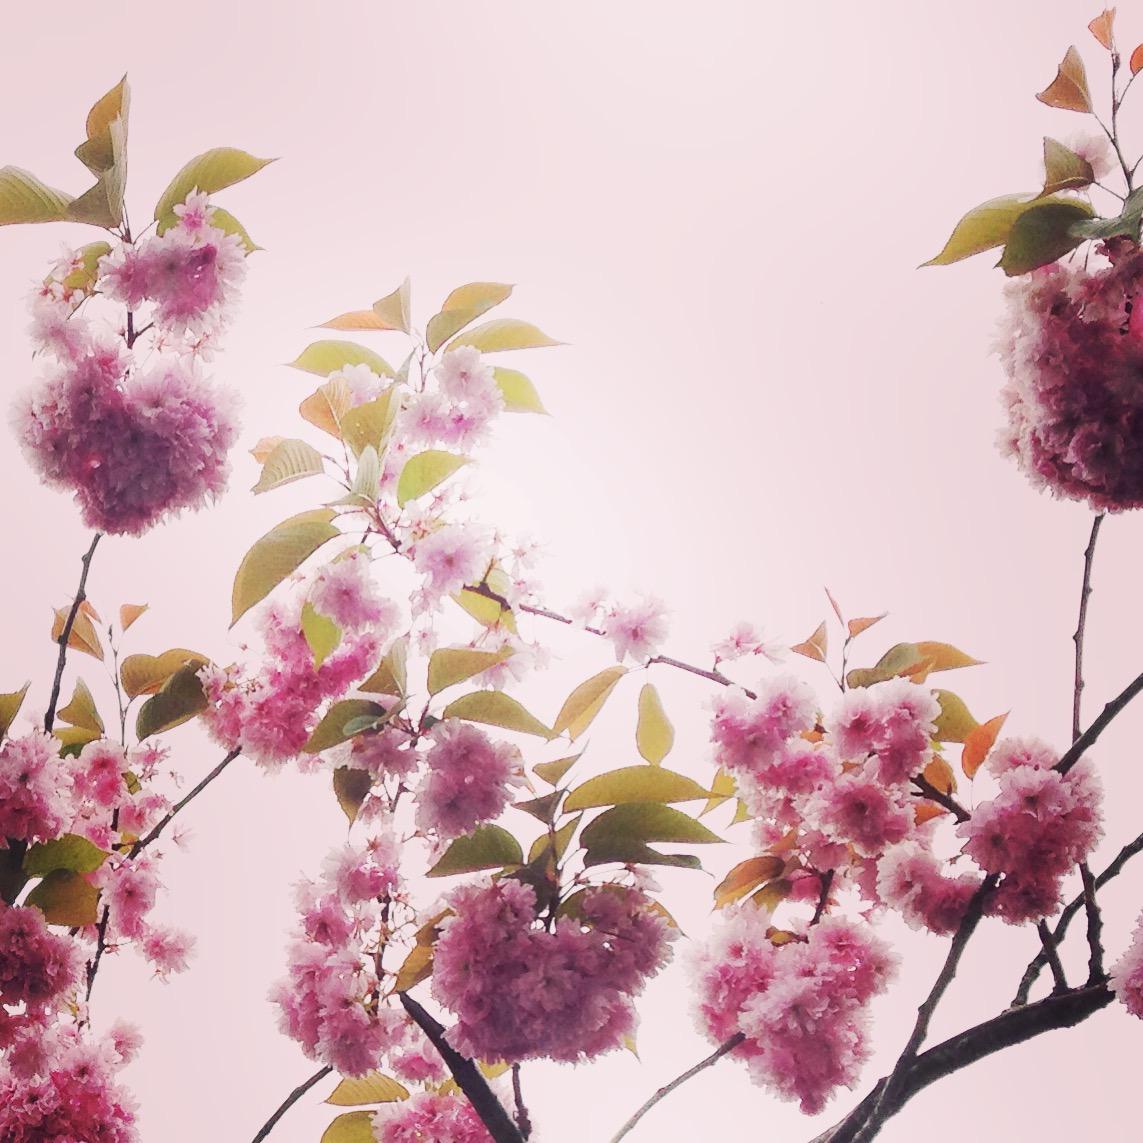 Blossom by Lindsay McDonagh